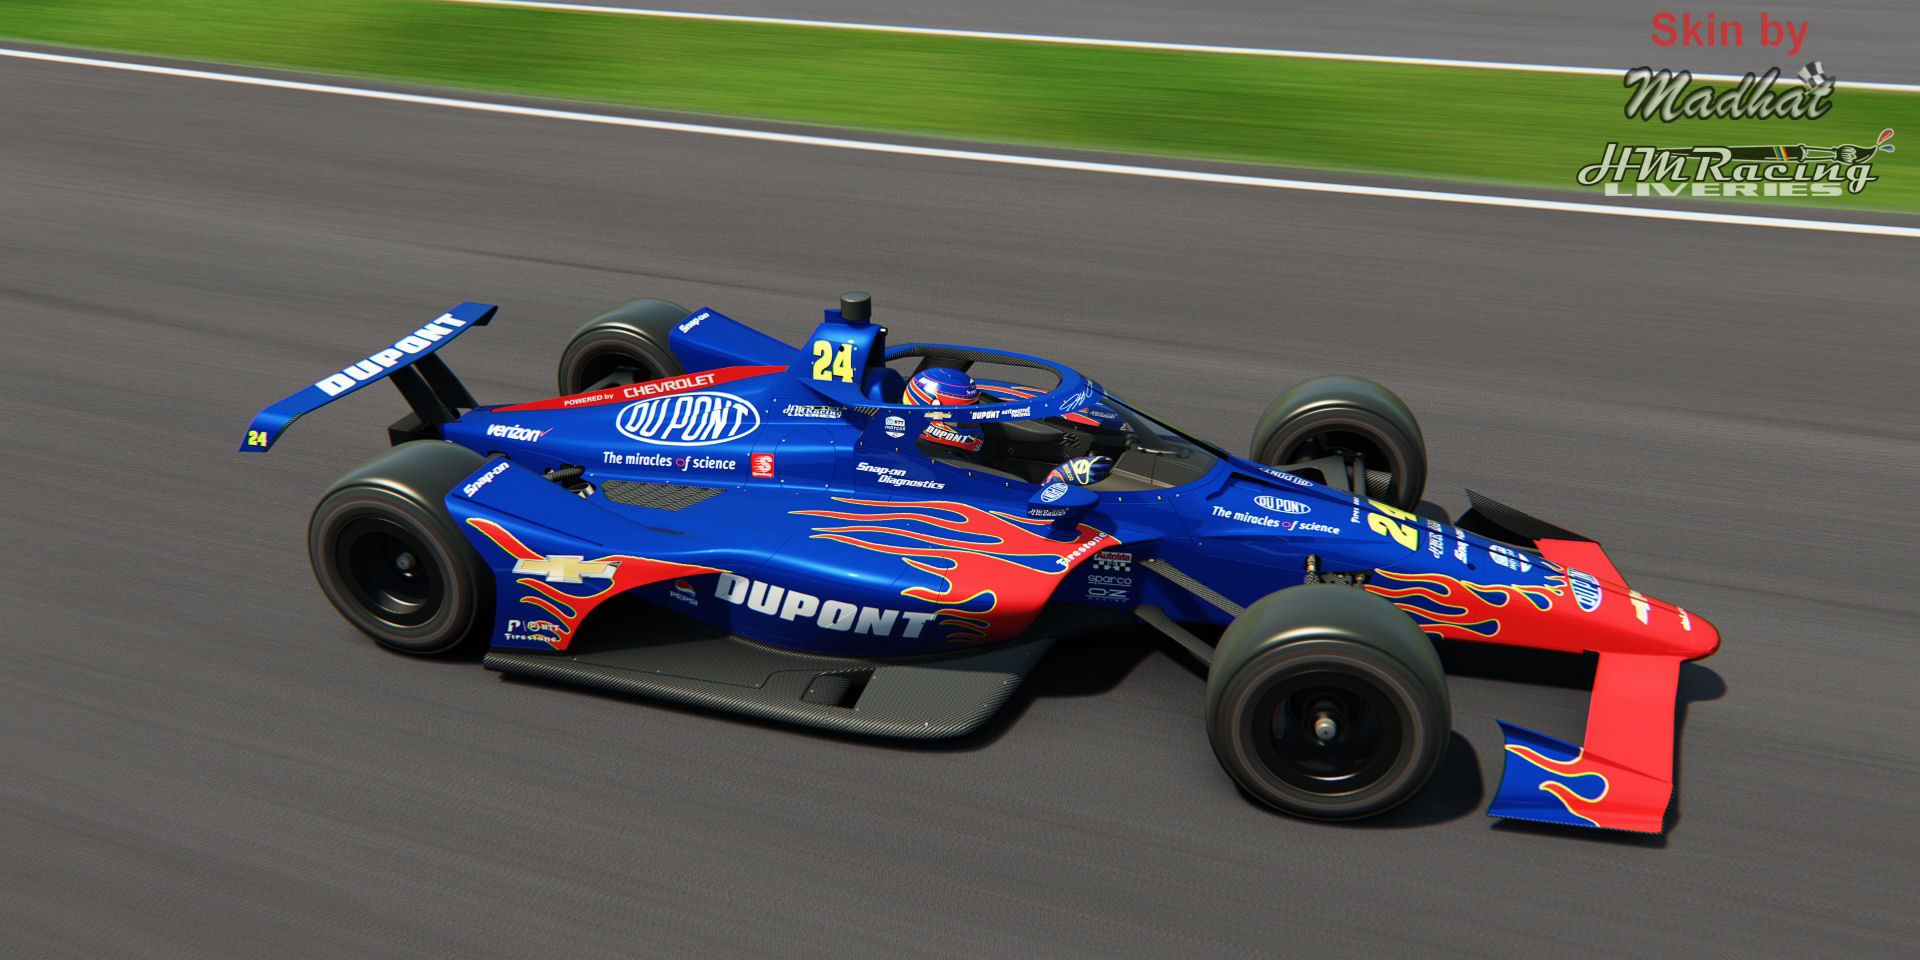 DU PONT Jeff Gordon 24 IndyCar Madhat HMRacing Liveries 05.jpg